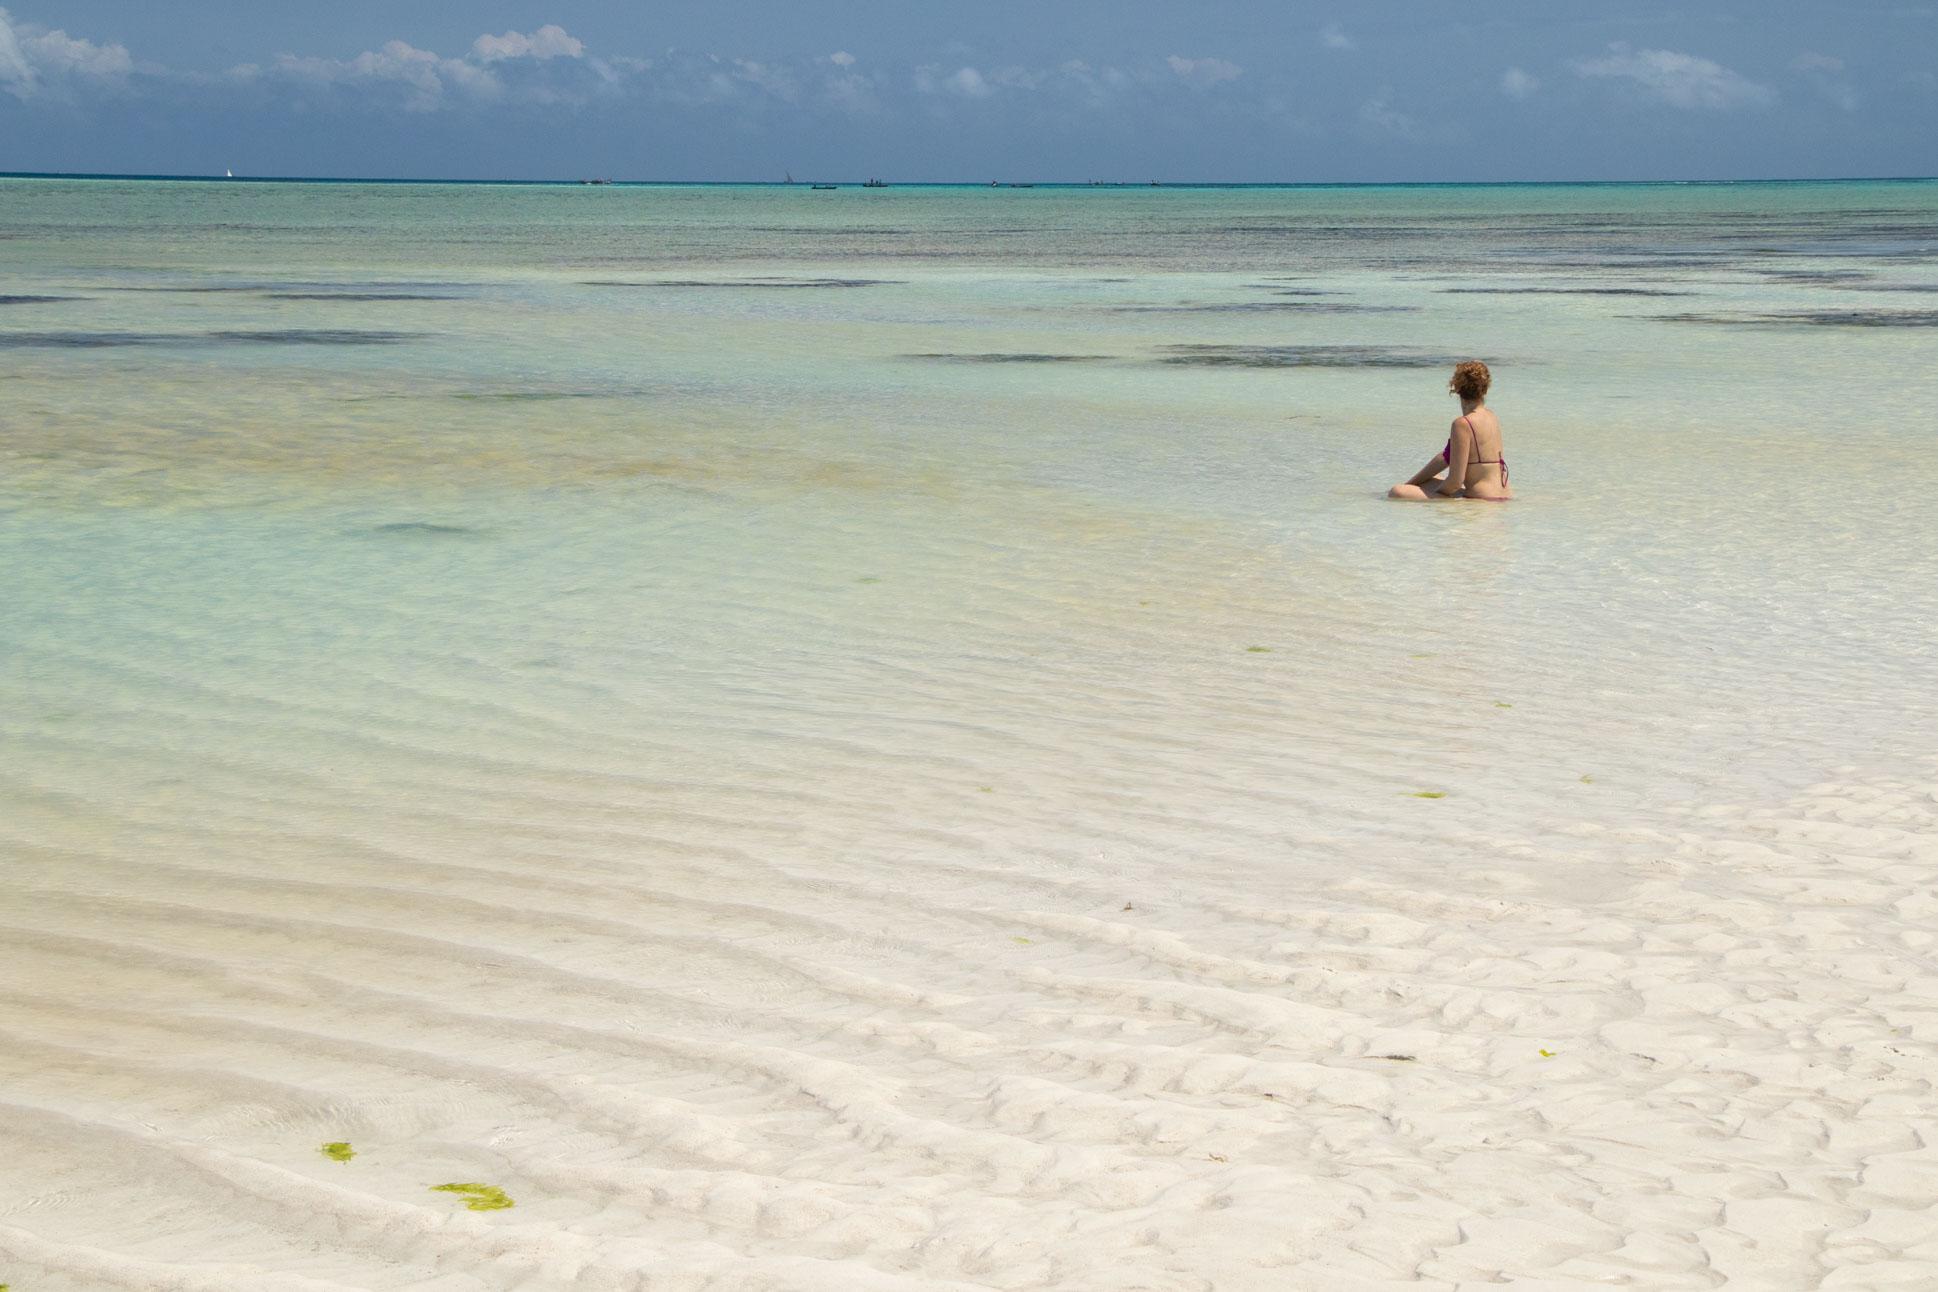 playa-de-nungwi-tanzania-19